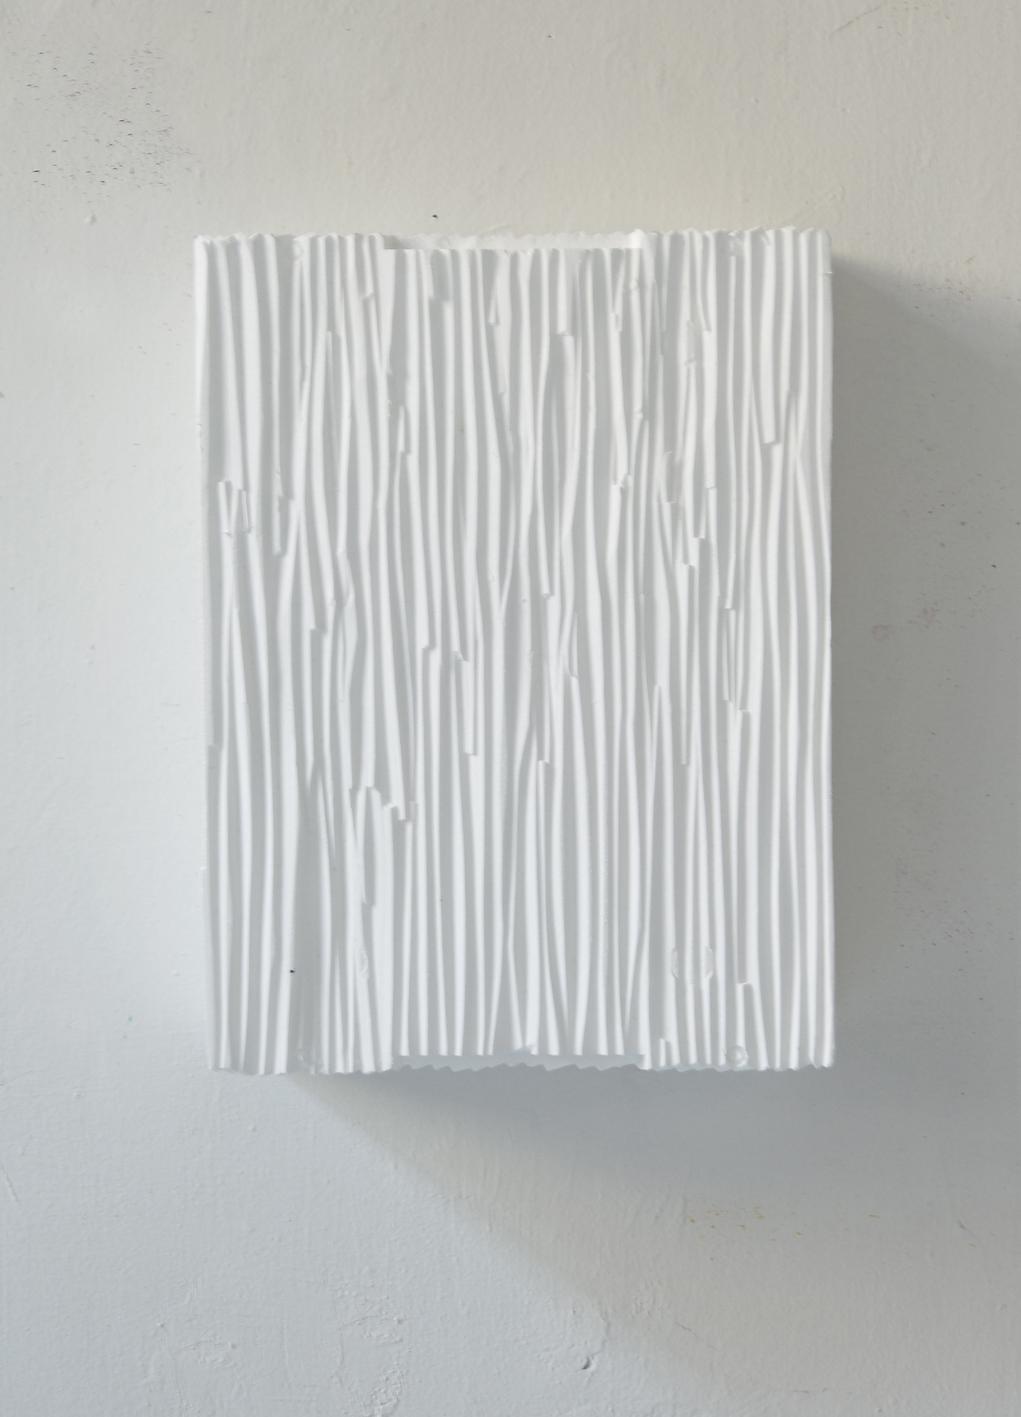 web222-Wallamp-panel-fixture-fishbox-frontview-rectangle-unlit-Gisela-Stiegler-MarionFriedmannGallery.jpg